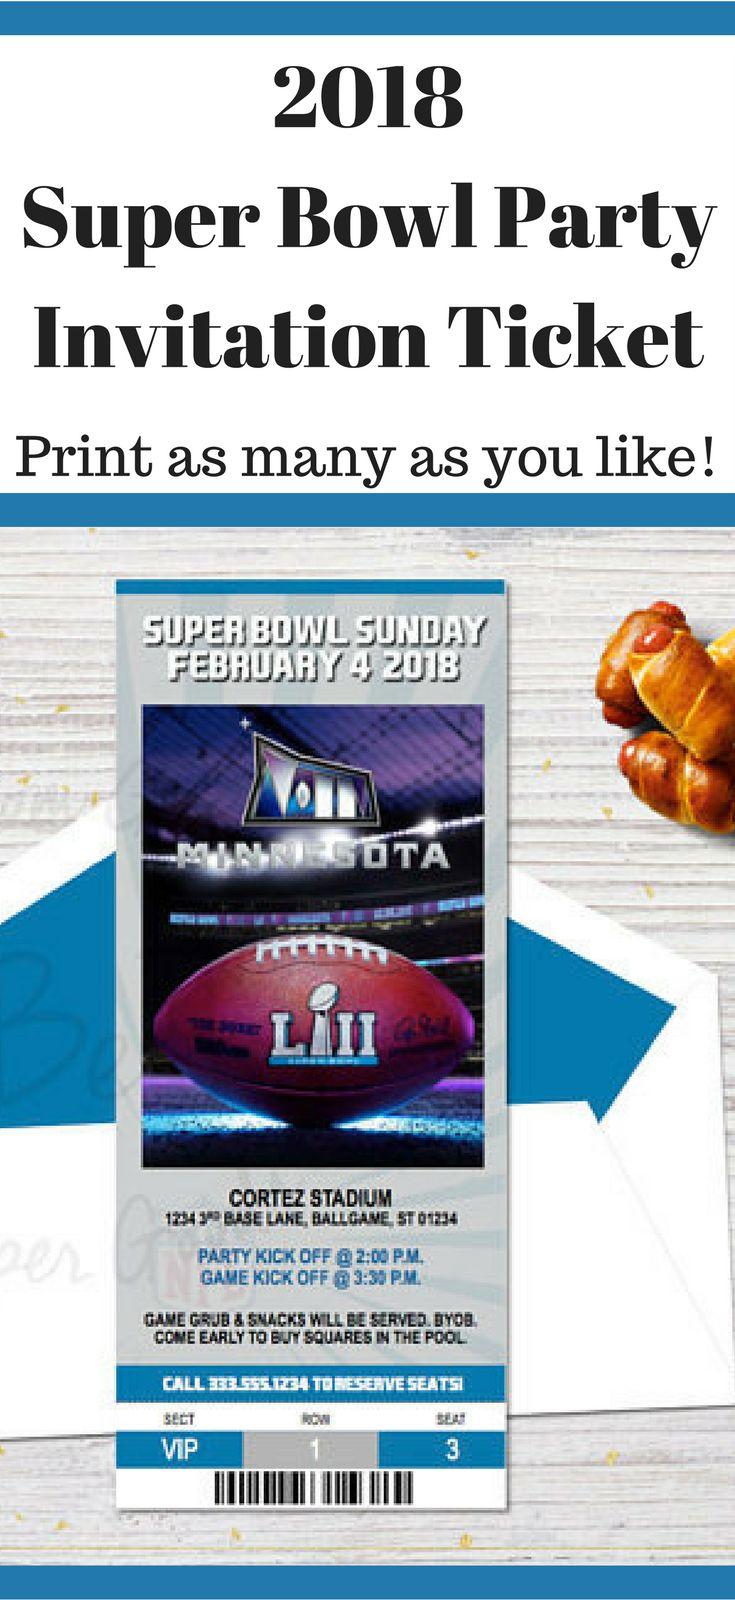 2018 Super Bowl Party Invitation Ticket | Printable Invitation #ad #superbowl #superbowlparty #printable #instantdownload #party #partyideas #invitation